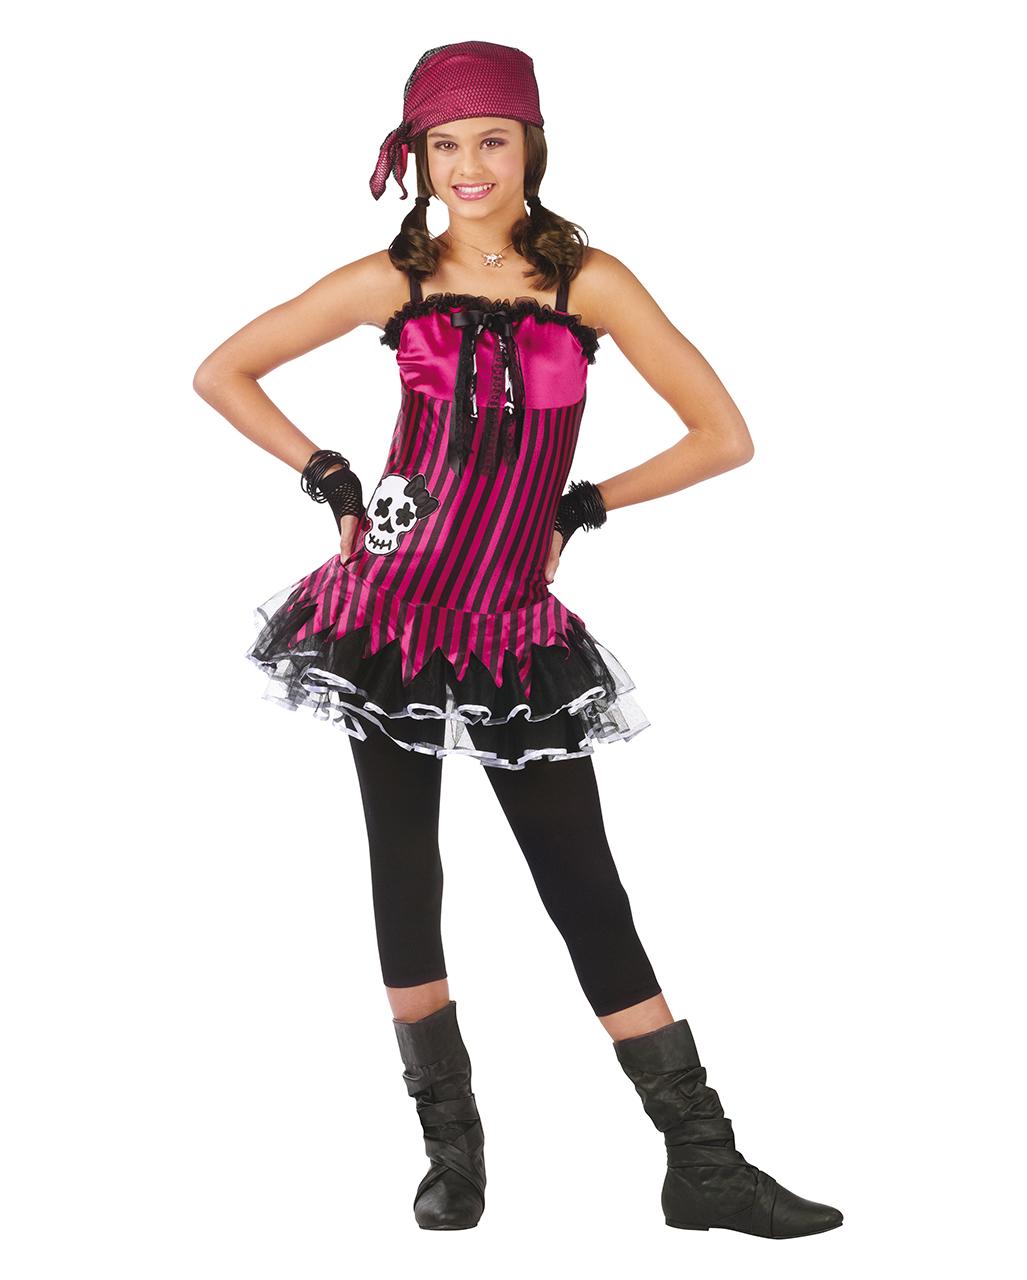 Rocking Skull Seerauberin Kostum Piratin Kostum Horror Shop Com